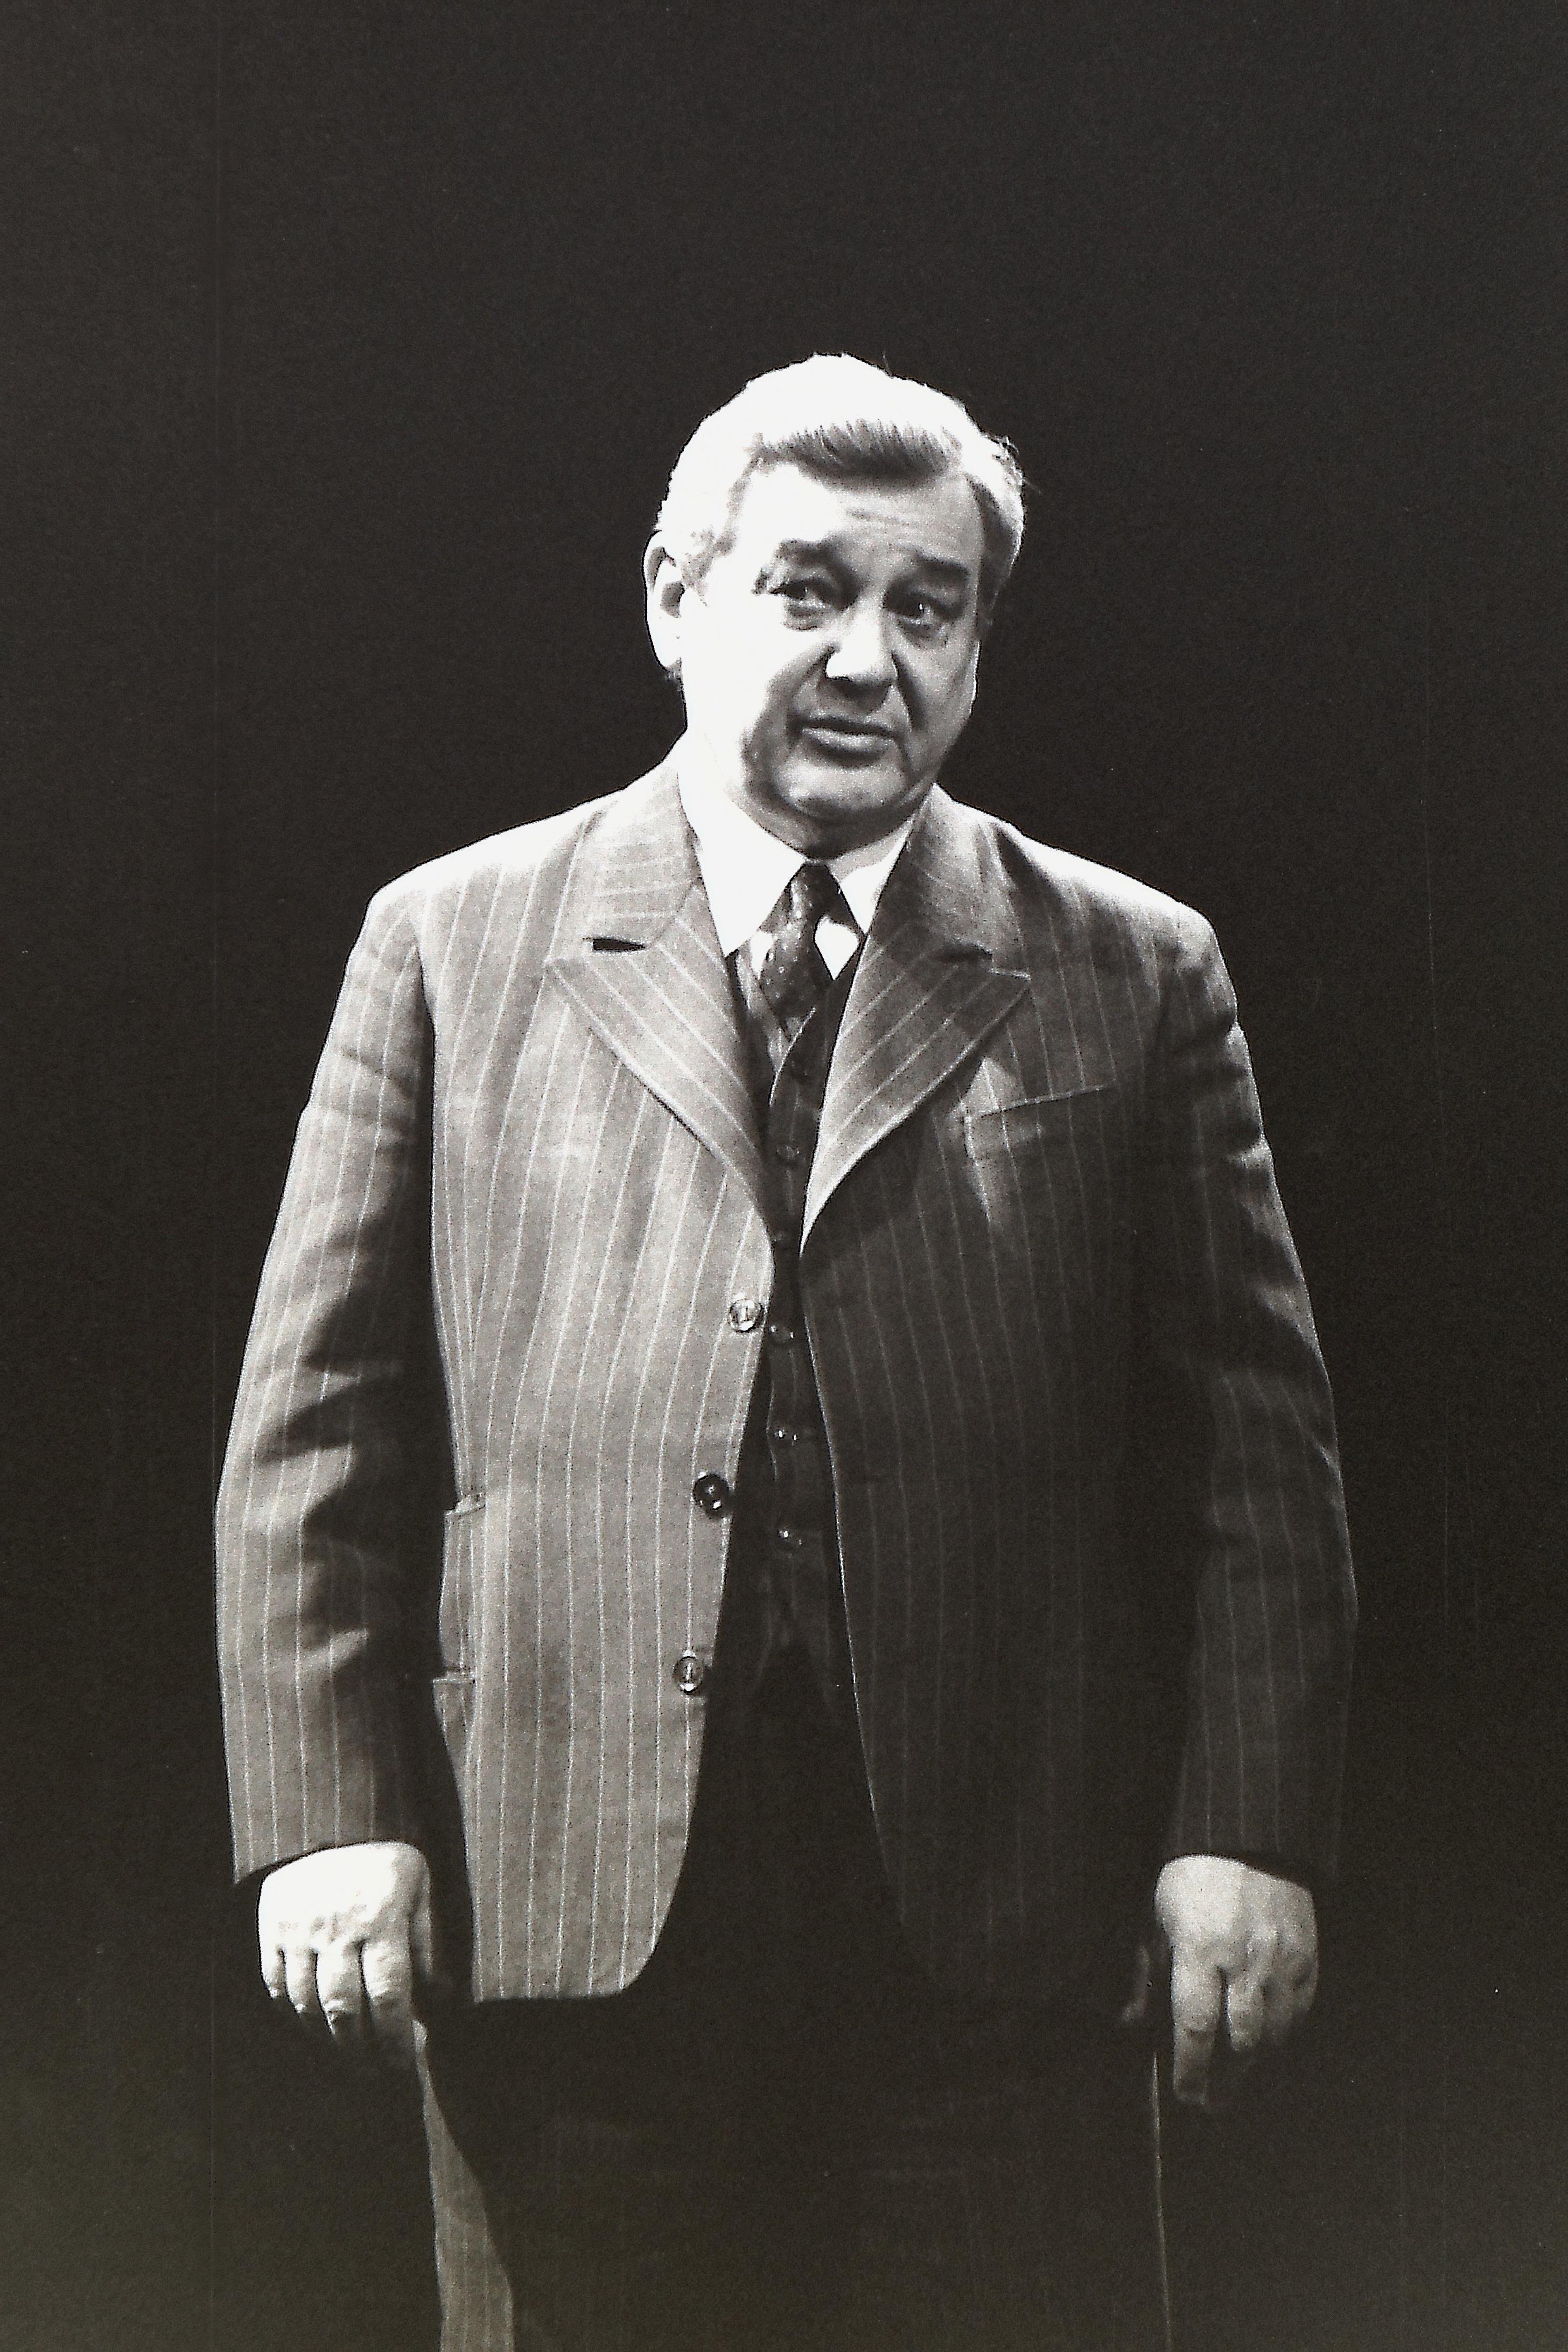 Josef vinklár portrait